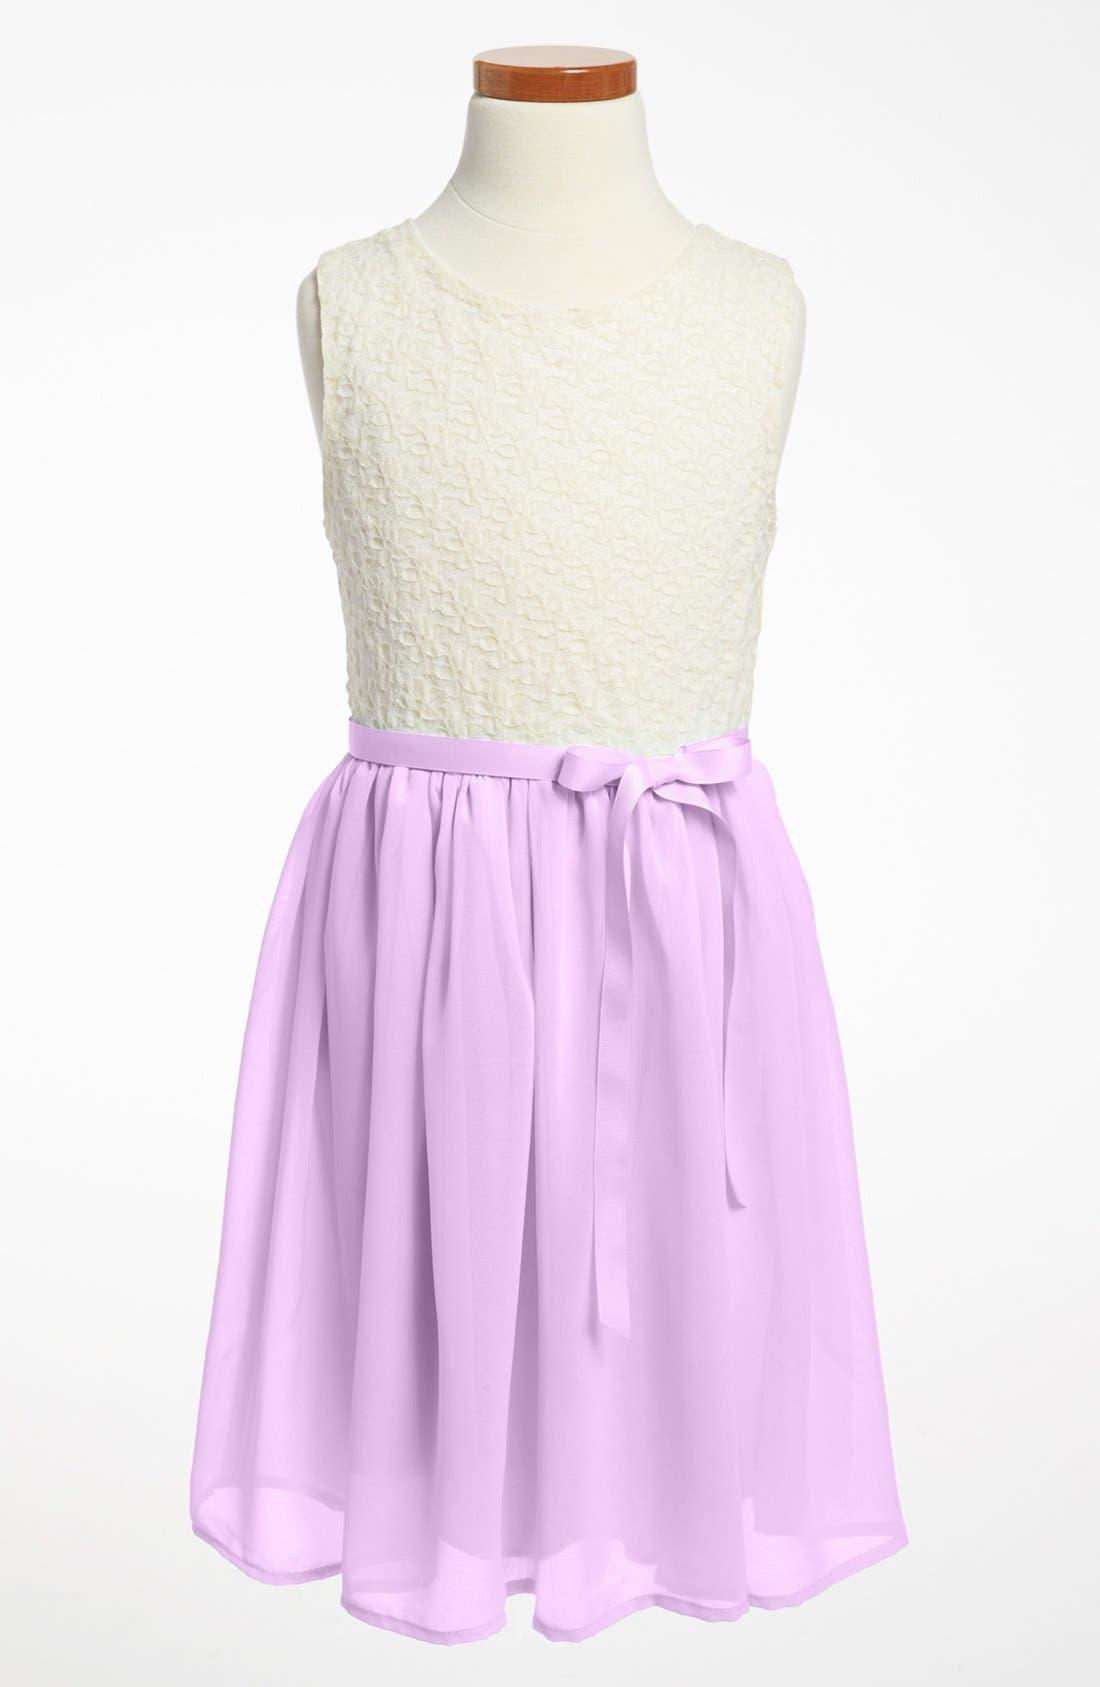 Main Image - Zunie Lace Bodice Dress (Little Girls & Big Girls)